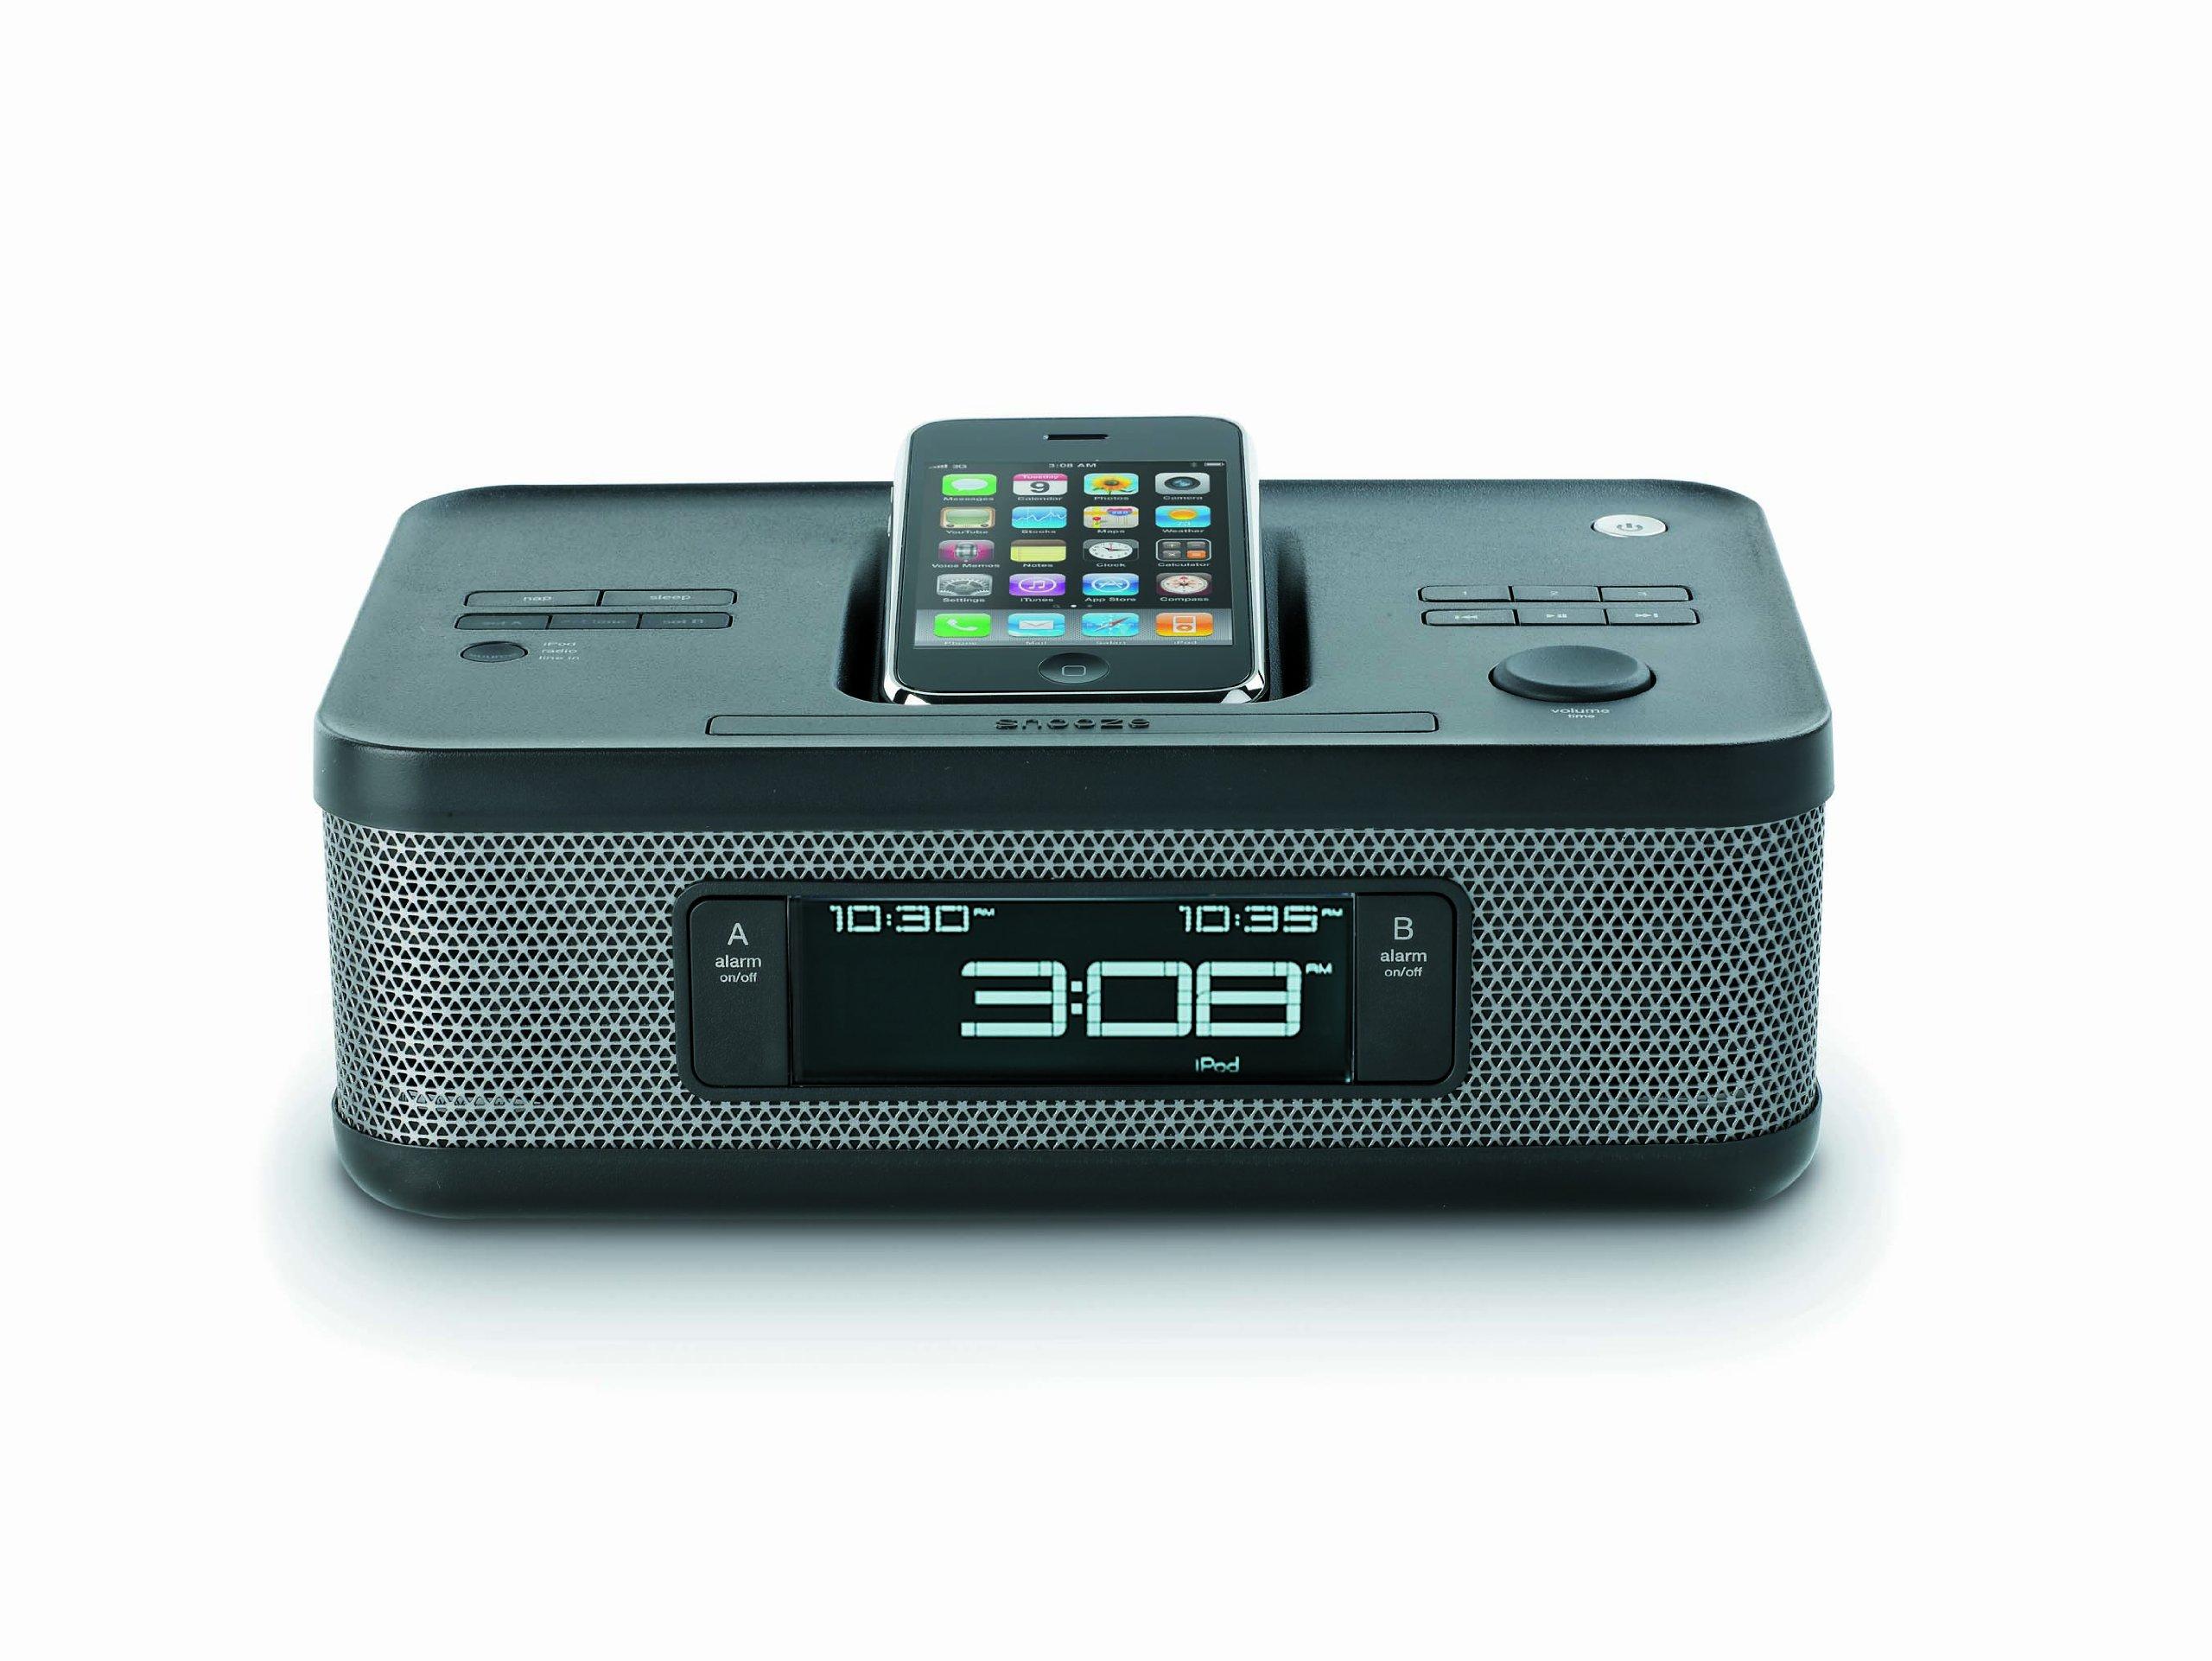 Memorex MI4703P 30-pin Dual Alarm Clock Radio for iPod and iPhone (Black) by Memorex